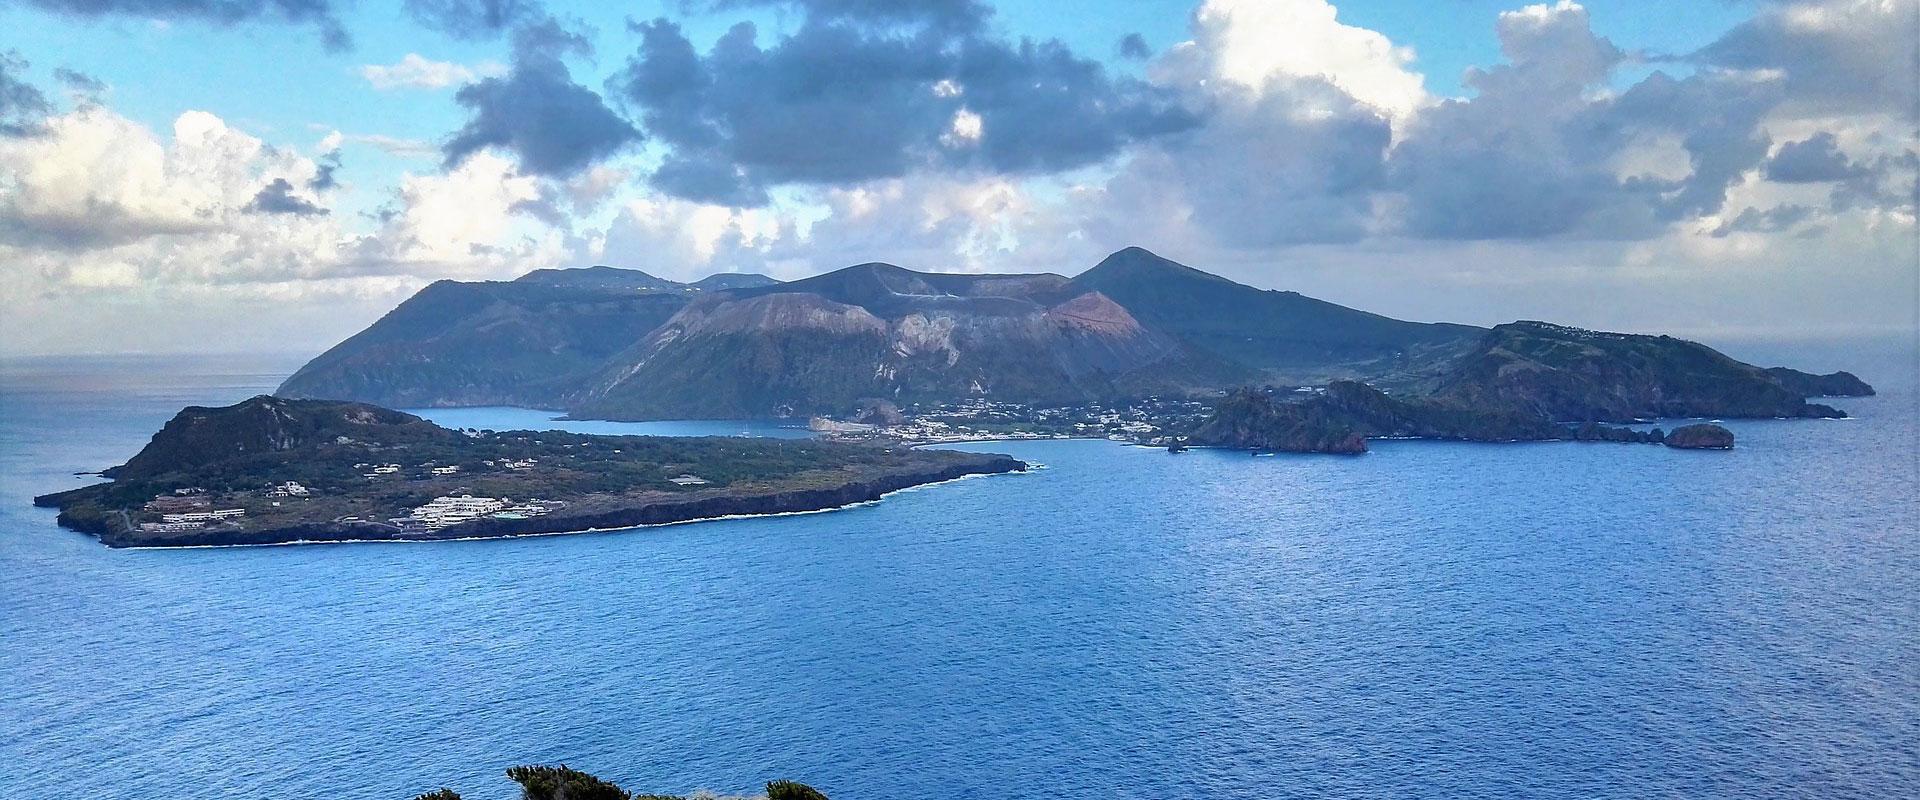 Etna & the Aeolian Islands